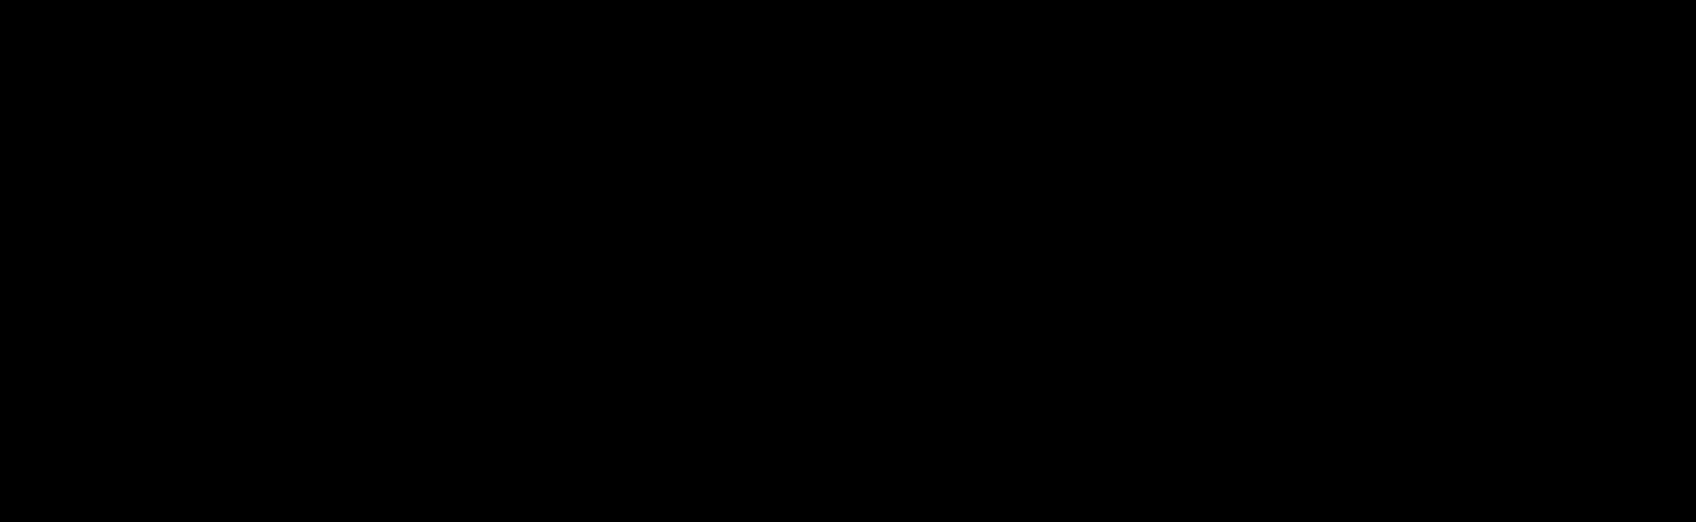 Paracetamol β-D-glucuronide